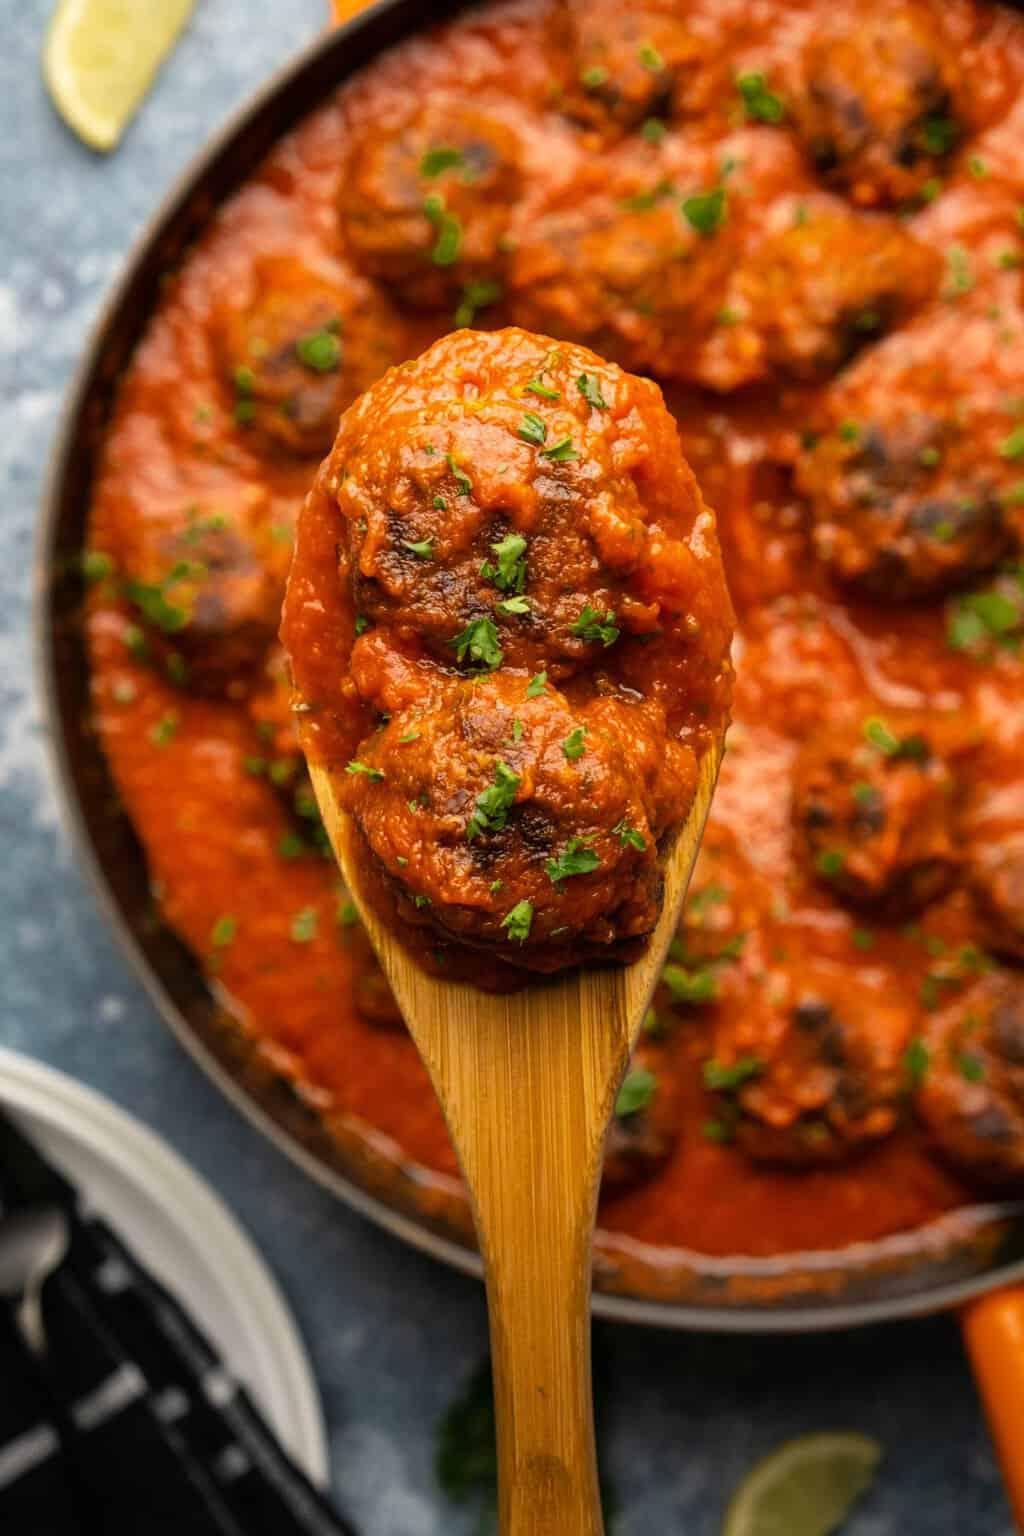 Vegan meatballs on a wooden spoon.